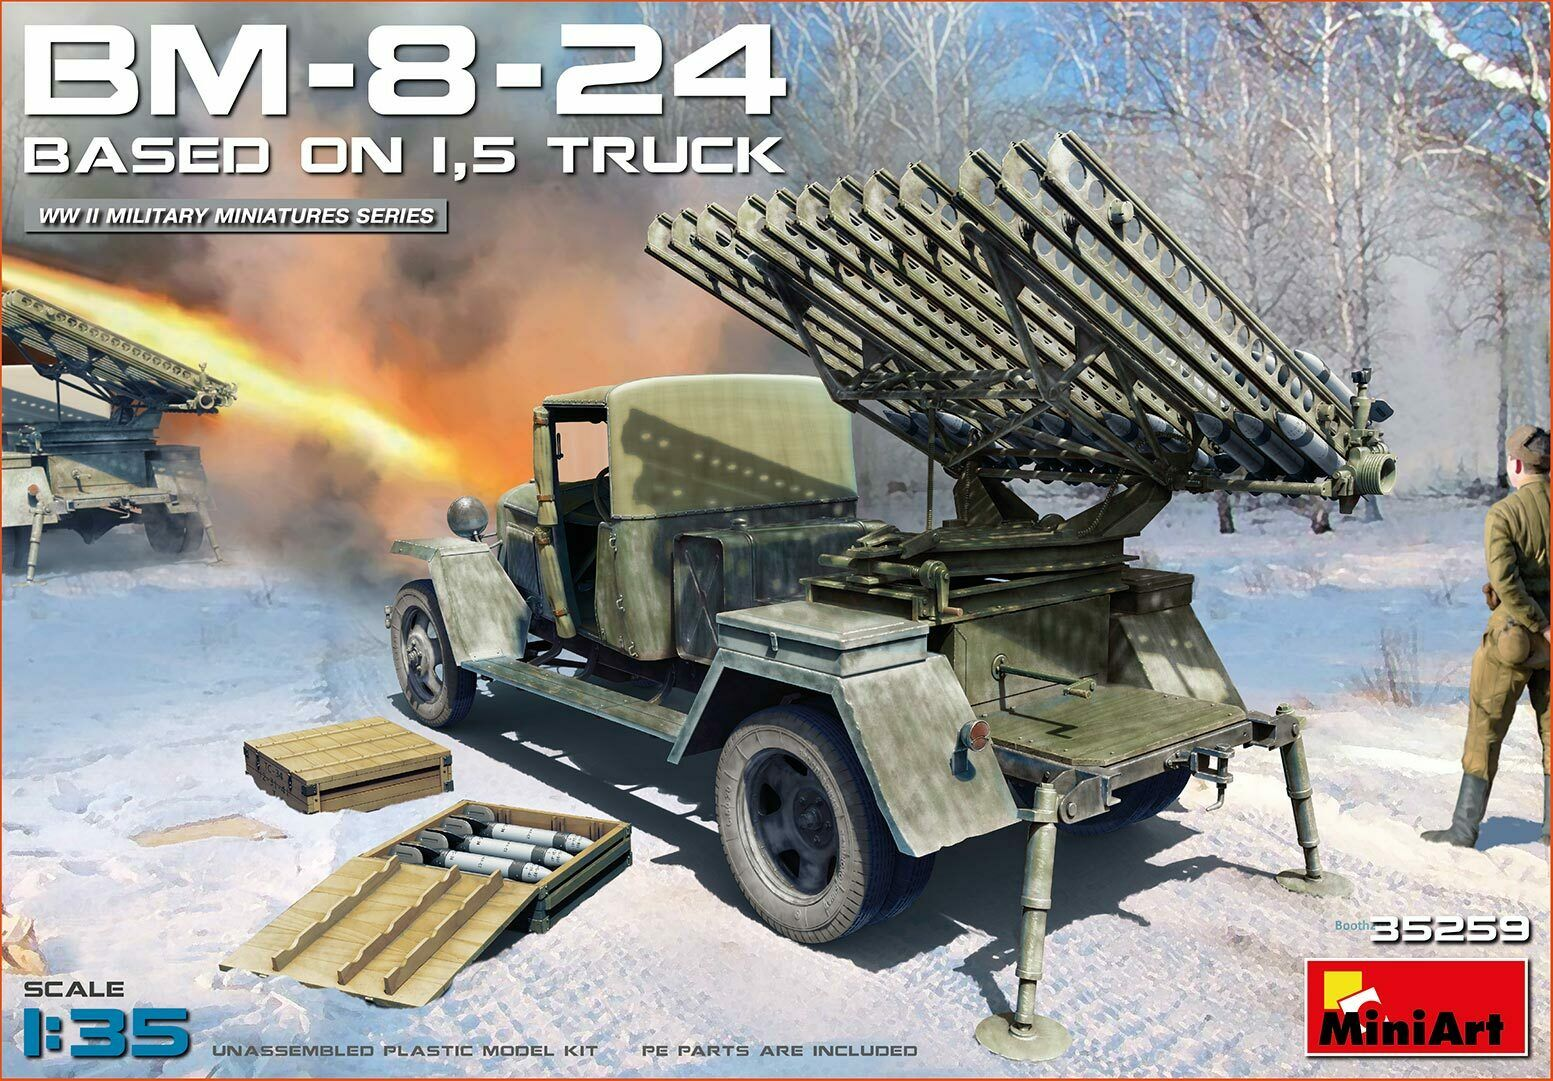 Miniart 1 35 Bm-8-24 Basato su 1.5t Camion